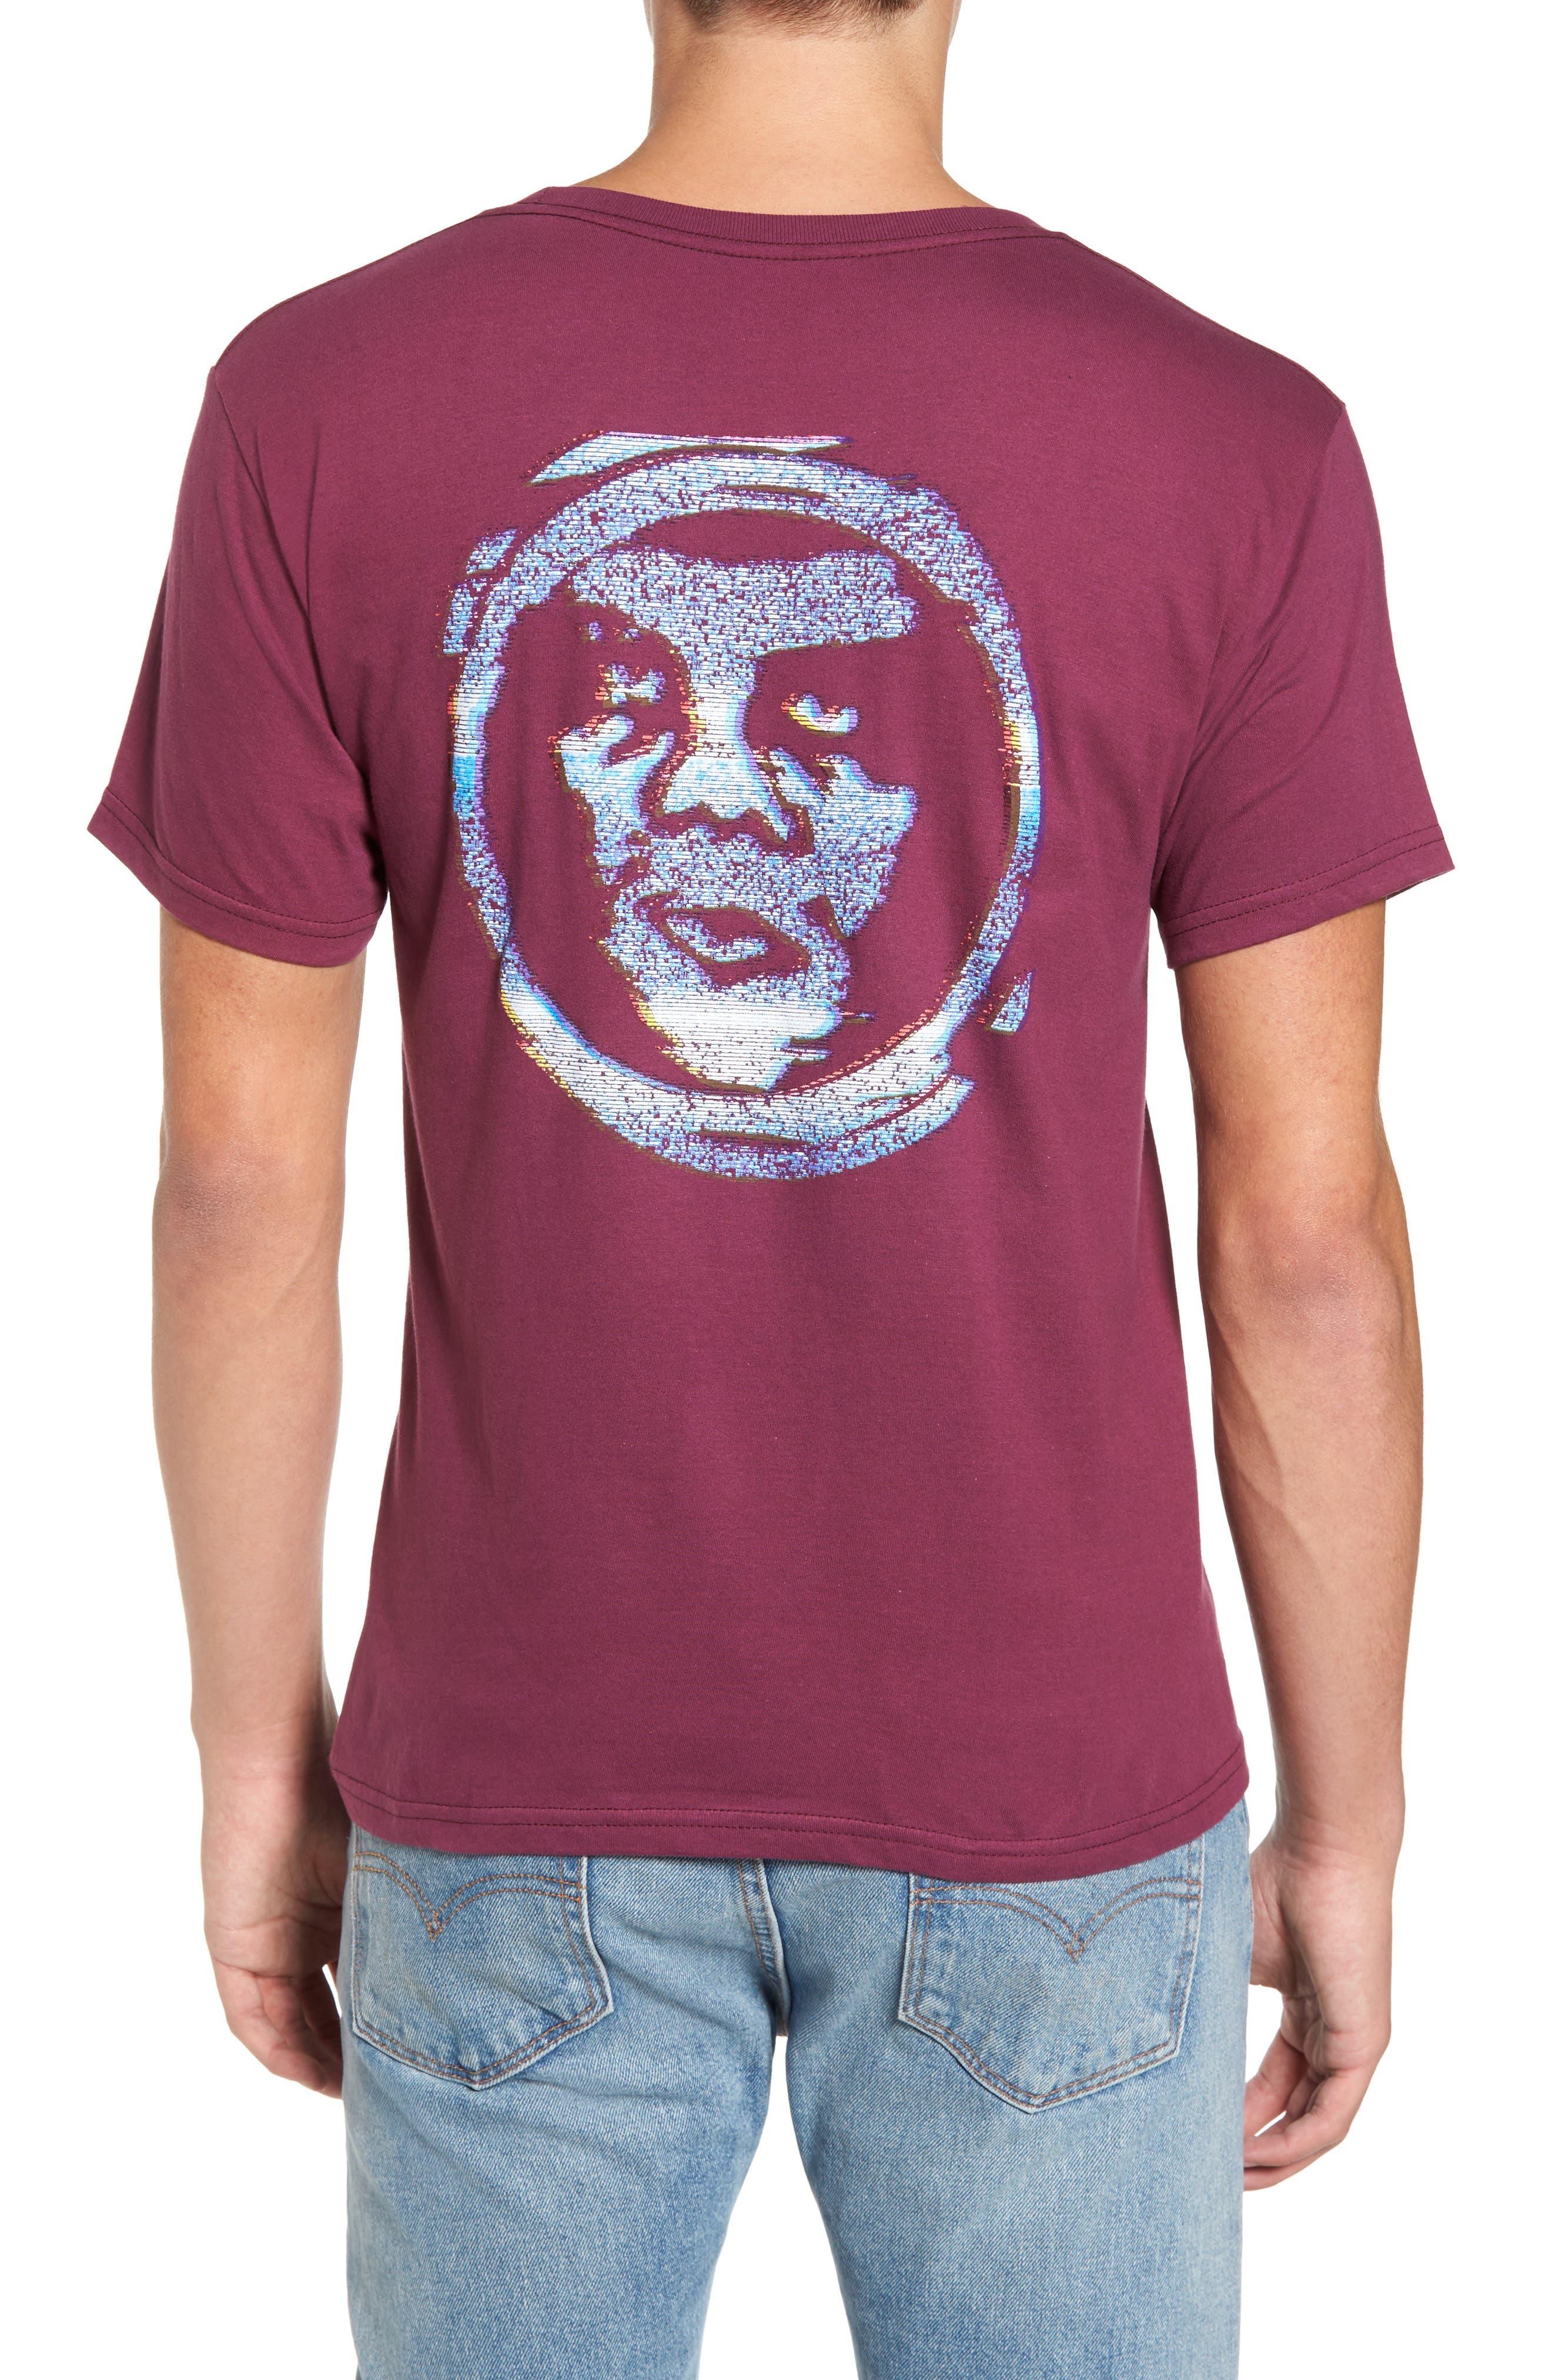 Creep Scan T-Shirt,                             Alternate thumbnail 2, color,                             930